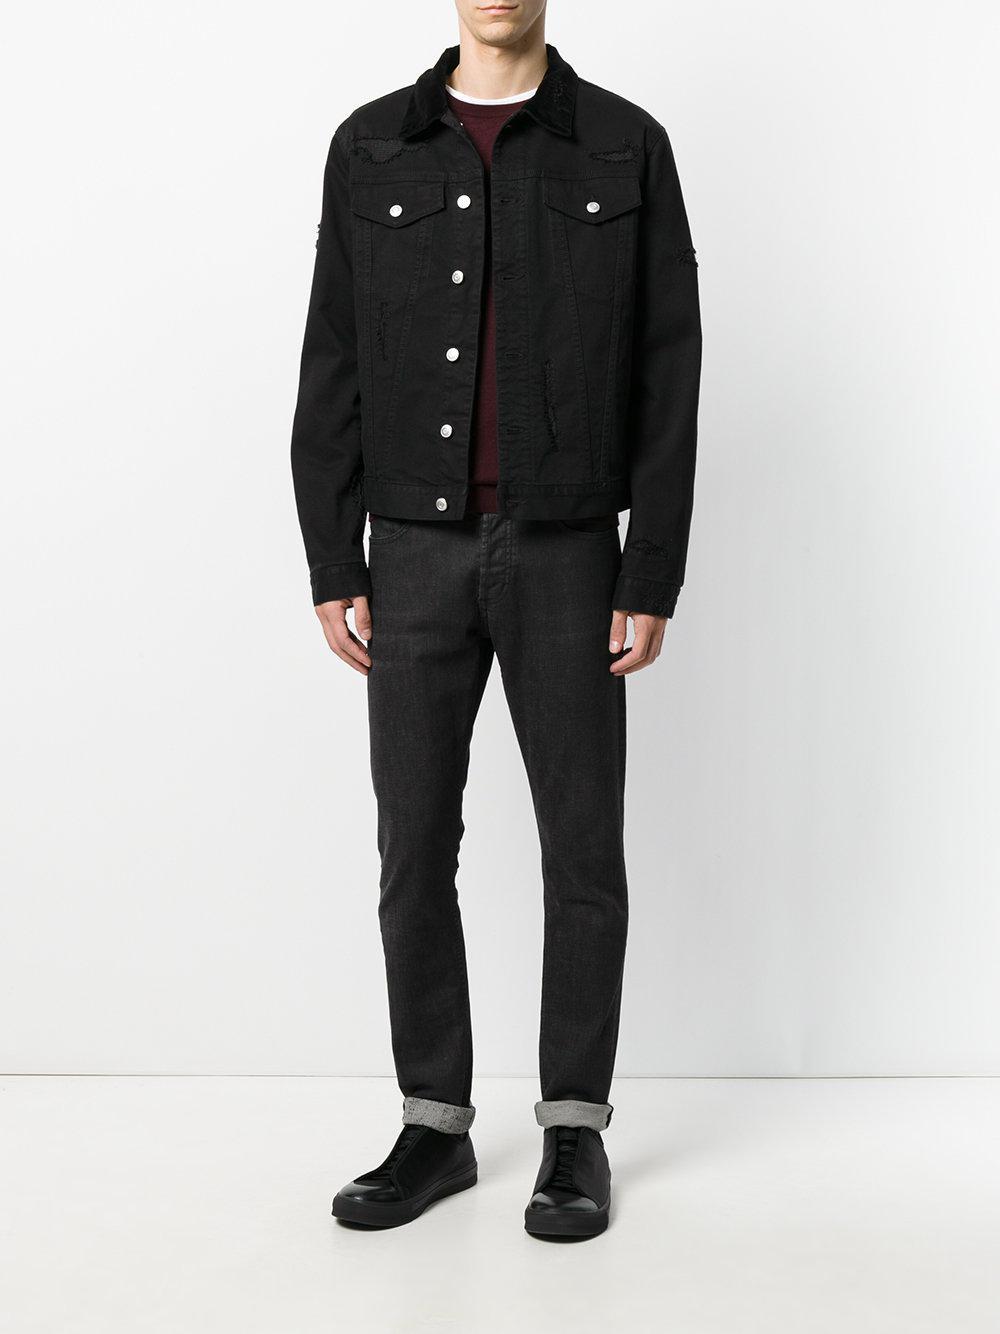 Lyst - Alexander mcqueen Distressed Denim Jacket in Black ...